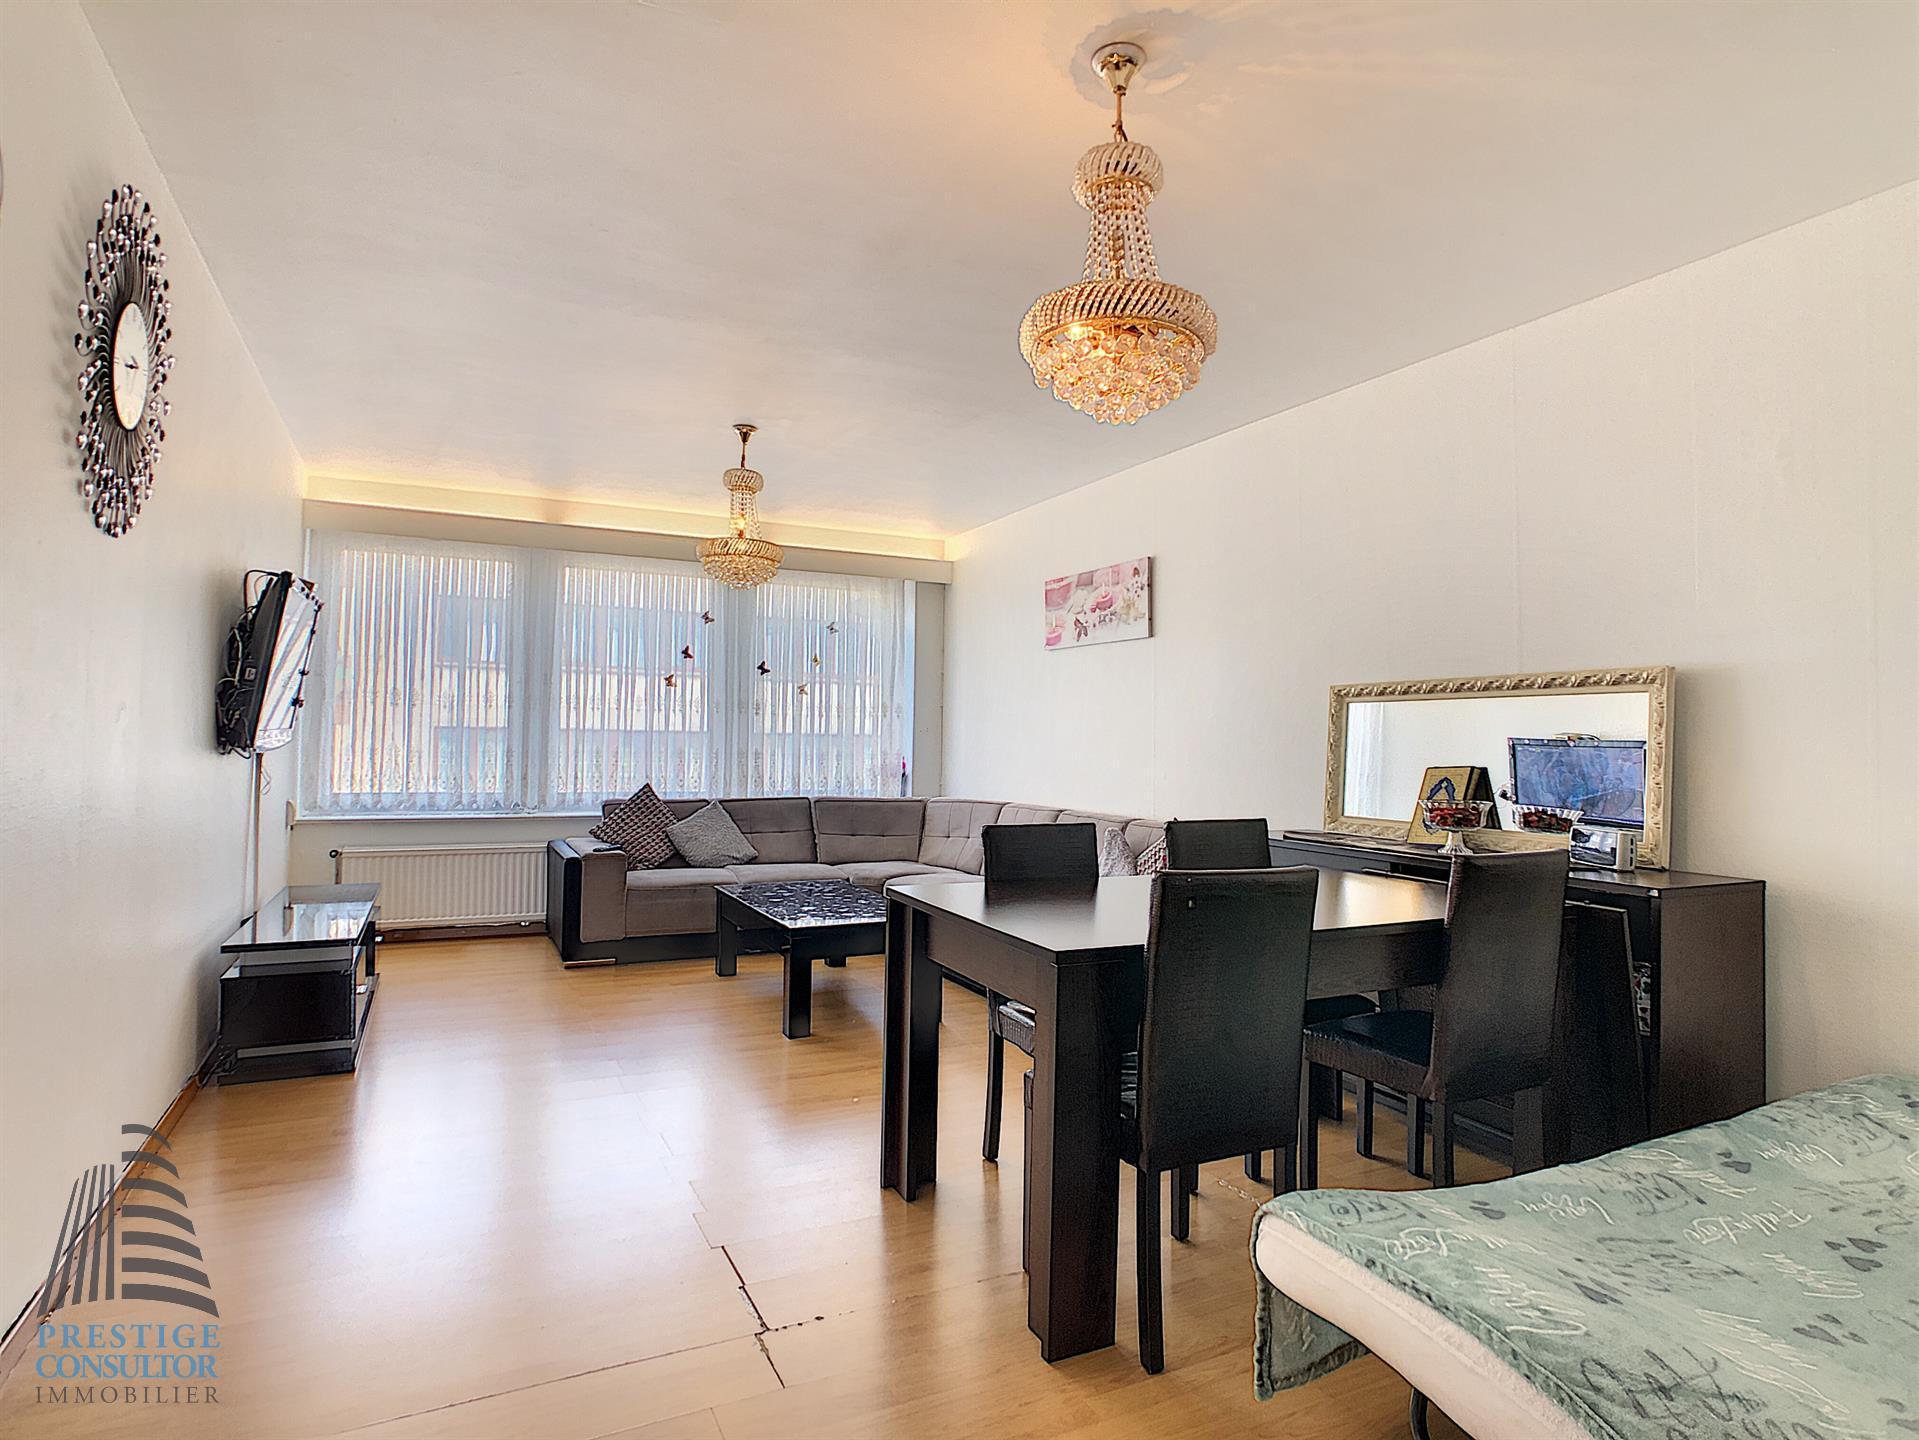 Appartement - Molenbeek-Saint-Jean - #3827564-0